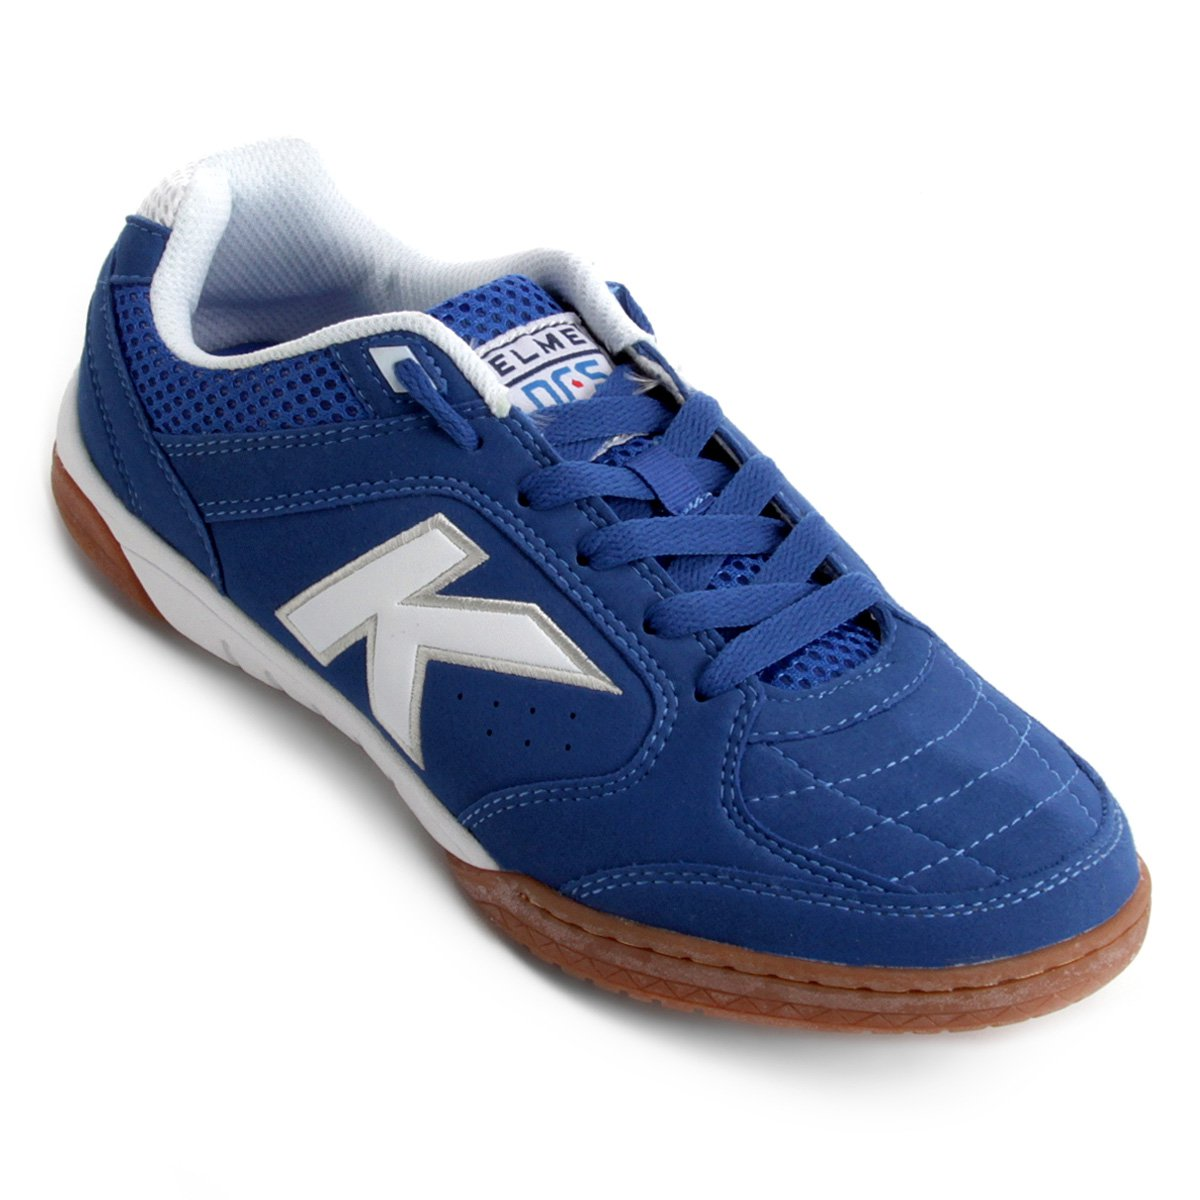 Futsal Precision Chuteira Kelme Branco e Azul Lnfs Masculina Chuteira Futsal  EvIqWFwxH ... 1a1fbc2750ceb